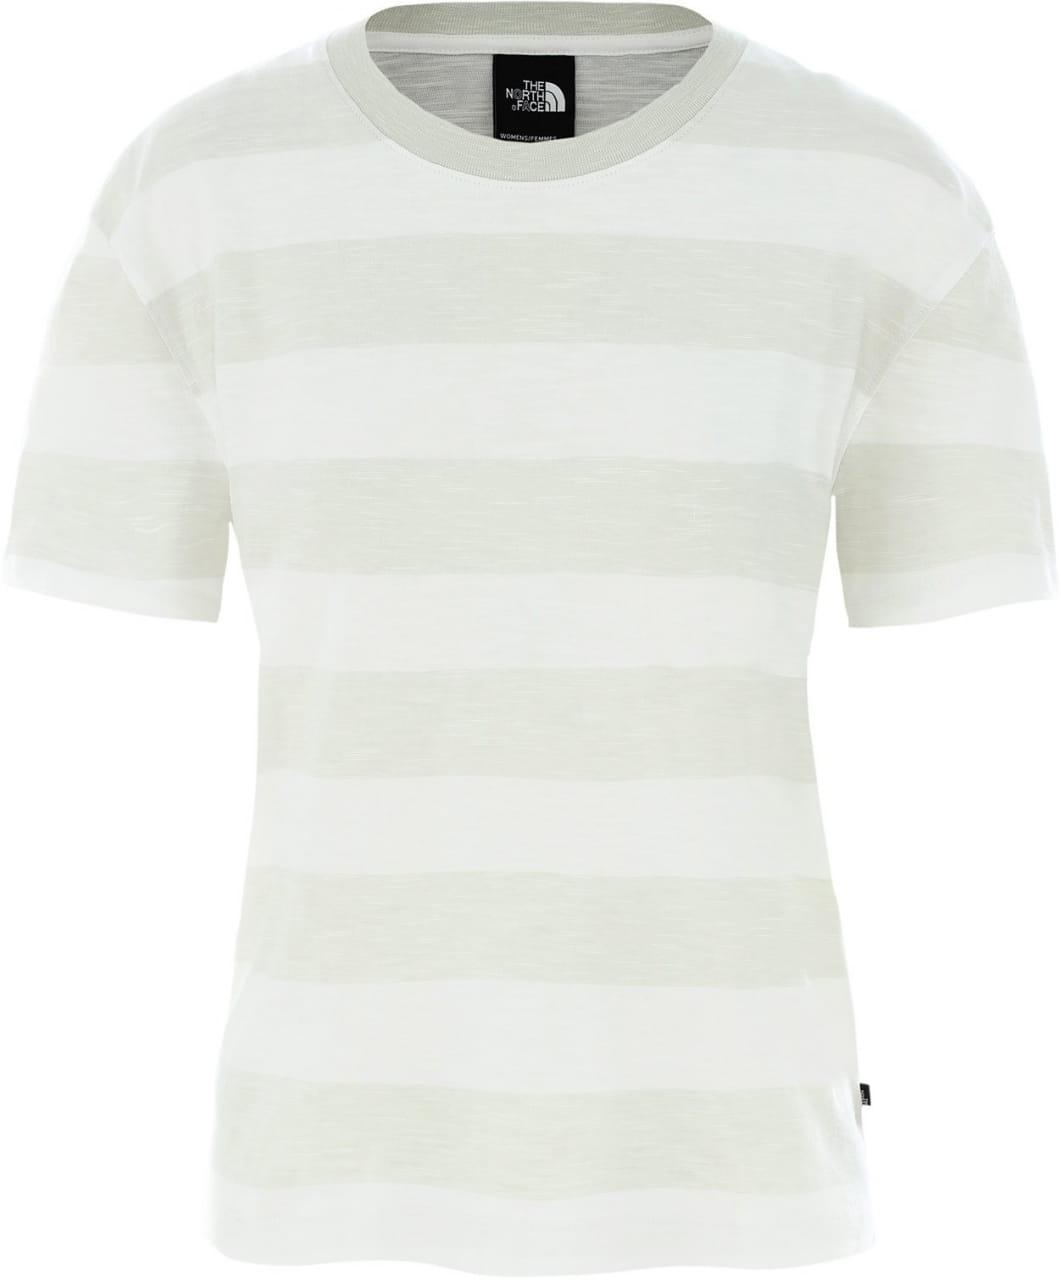 Dámské pletené tričko The North Face Women's Stripe Knit Short-Sleeve T-Shirt